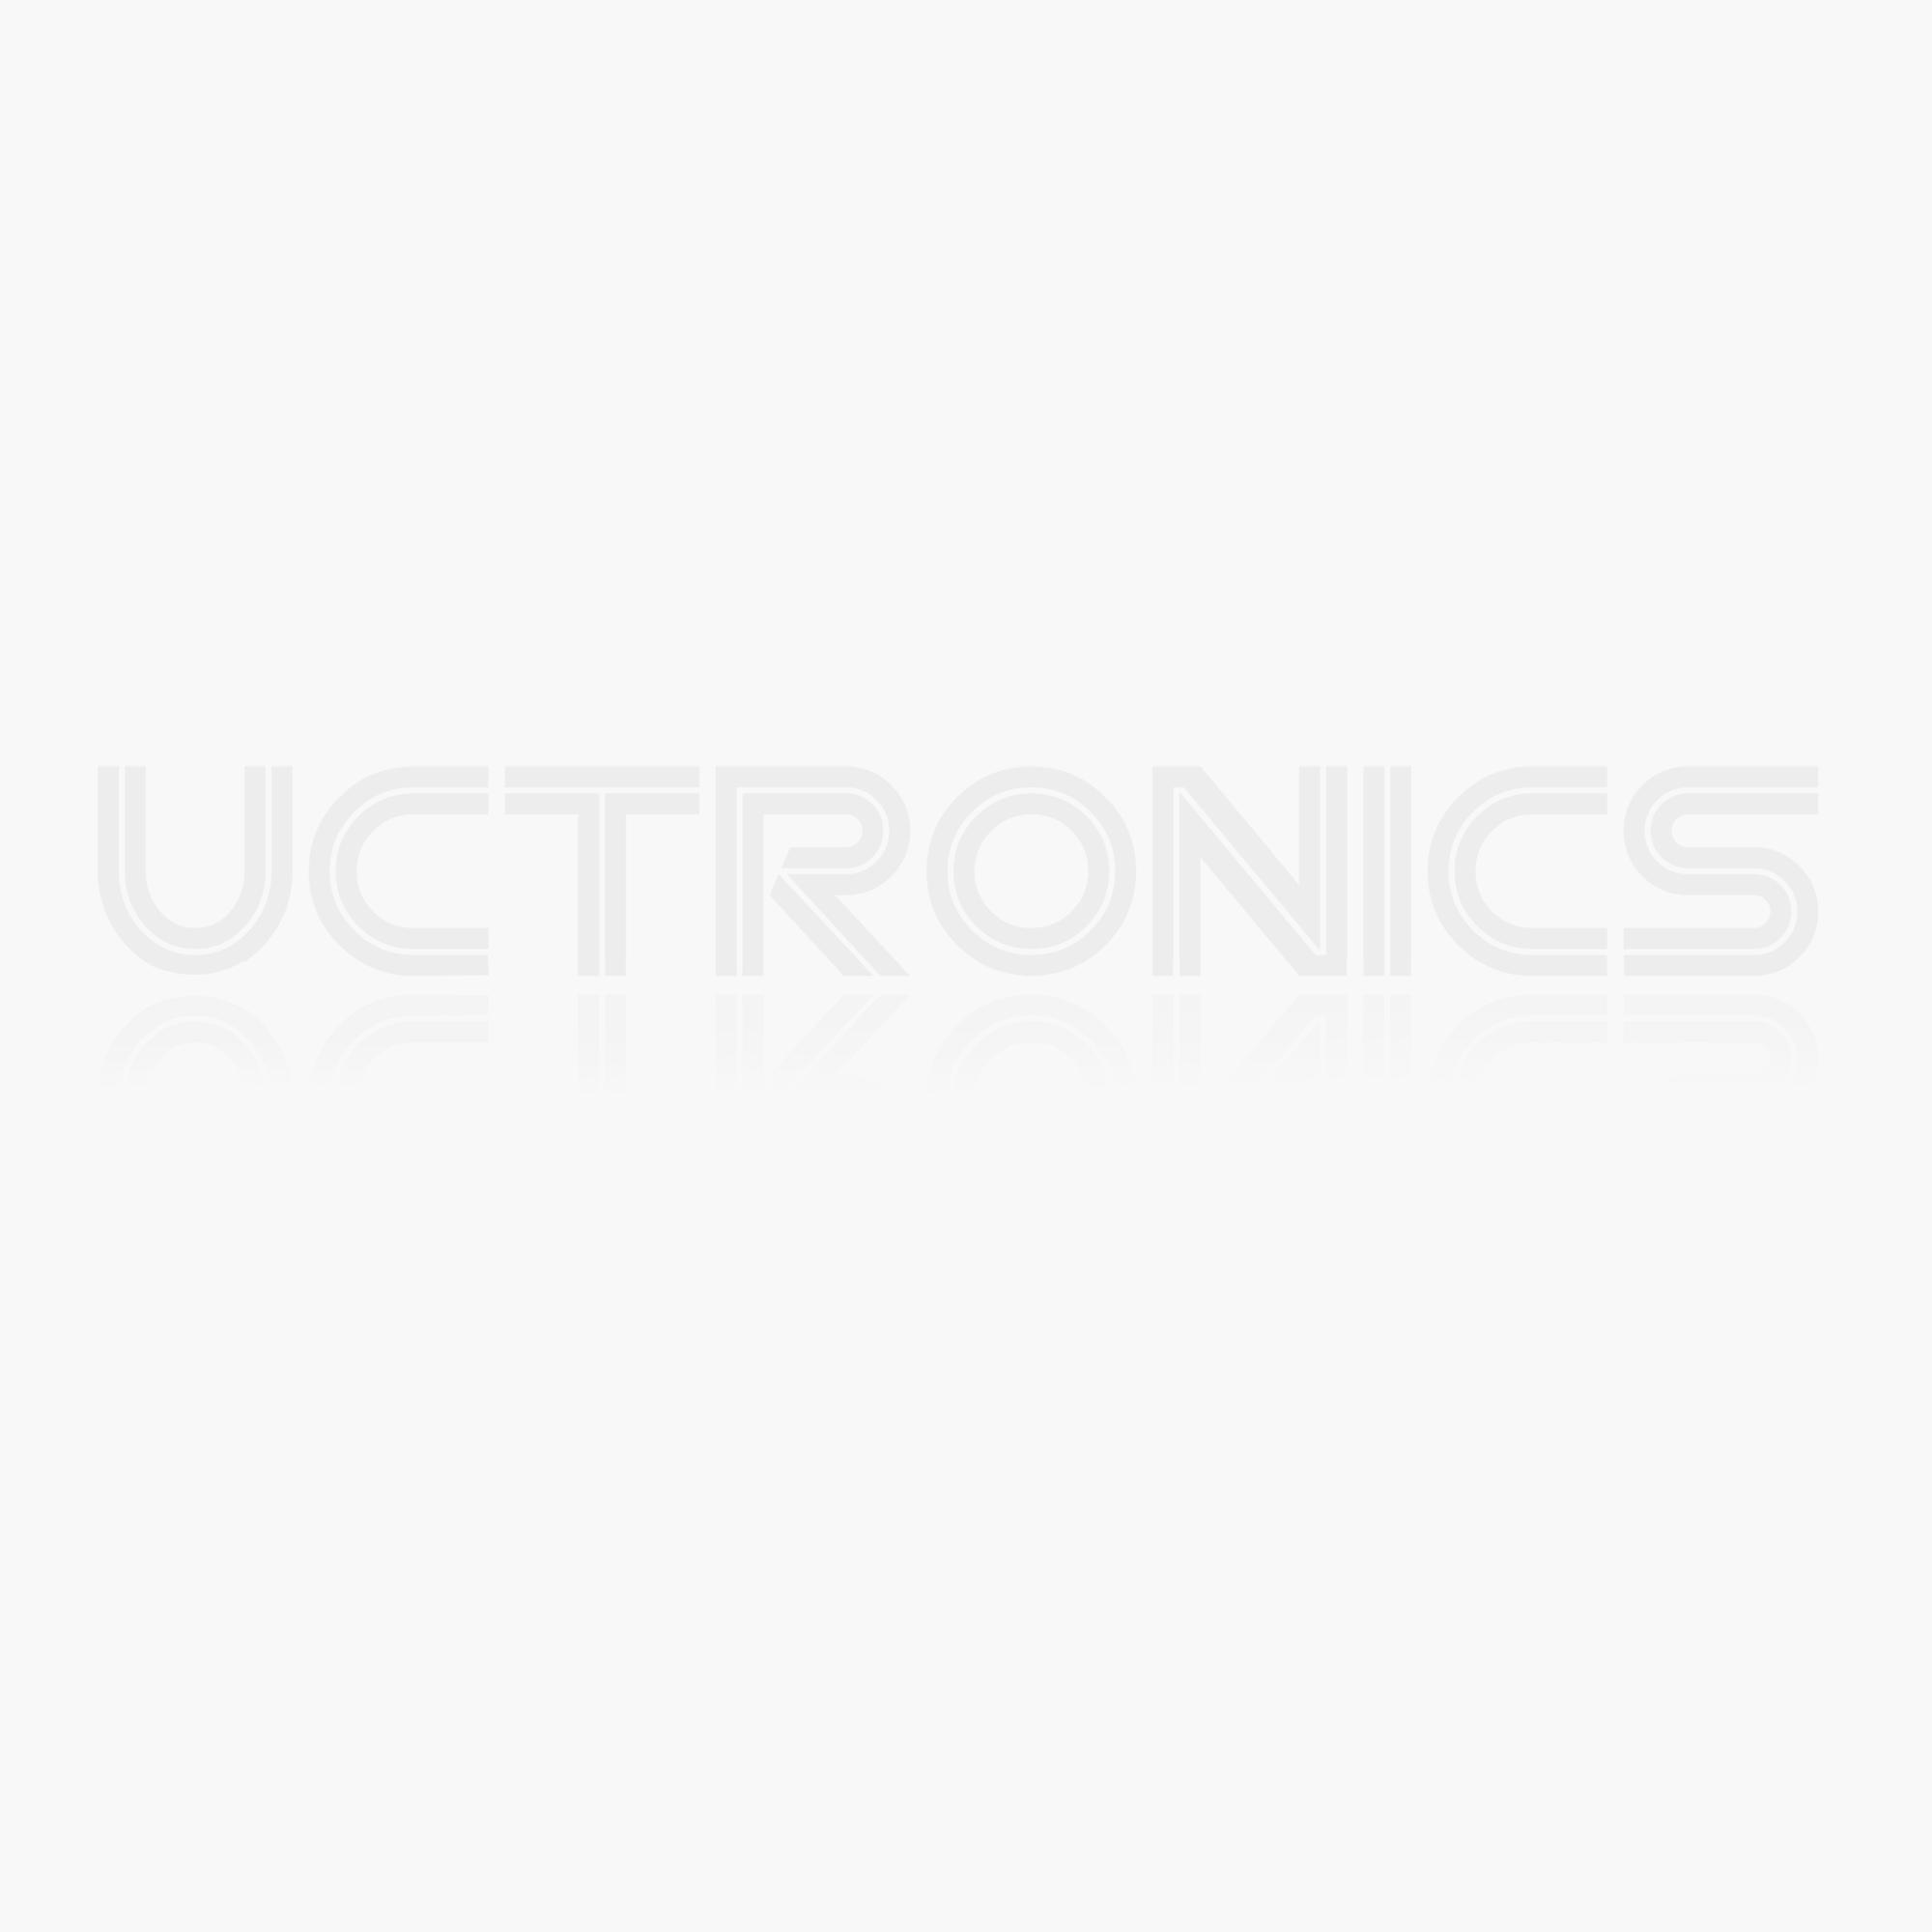 Best 20 Arduino duemilanove ideas on Pinterest Arduino